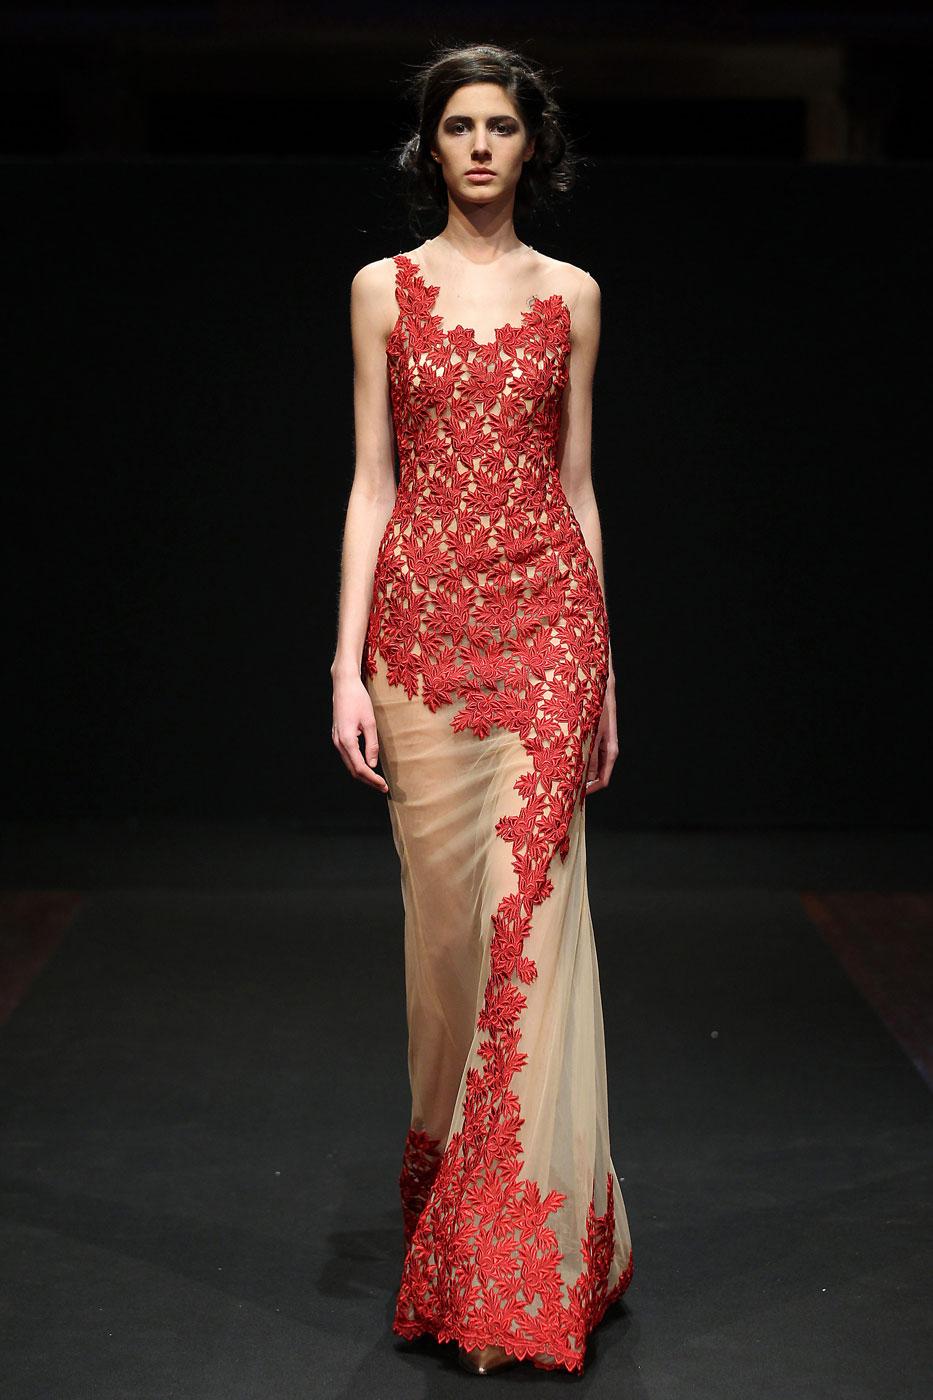 Abed-Mahfouz-fashion-runway-show-haute-couture-paris-spring-2015-the-impression-31